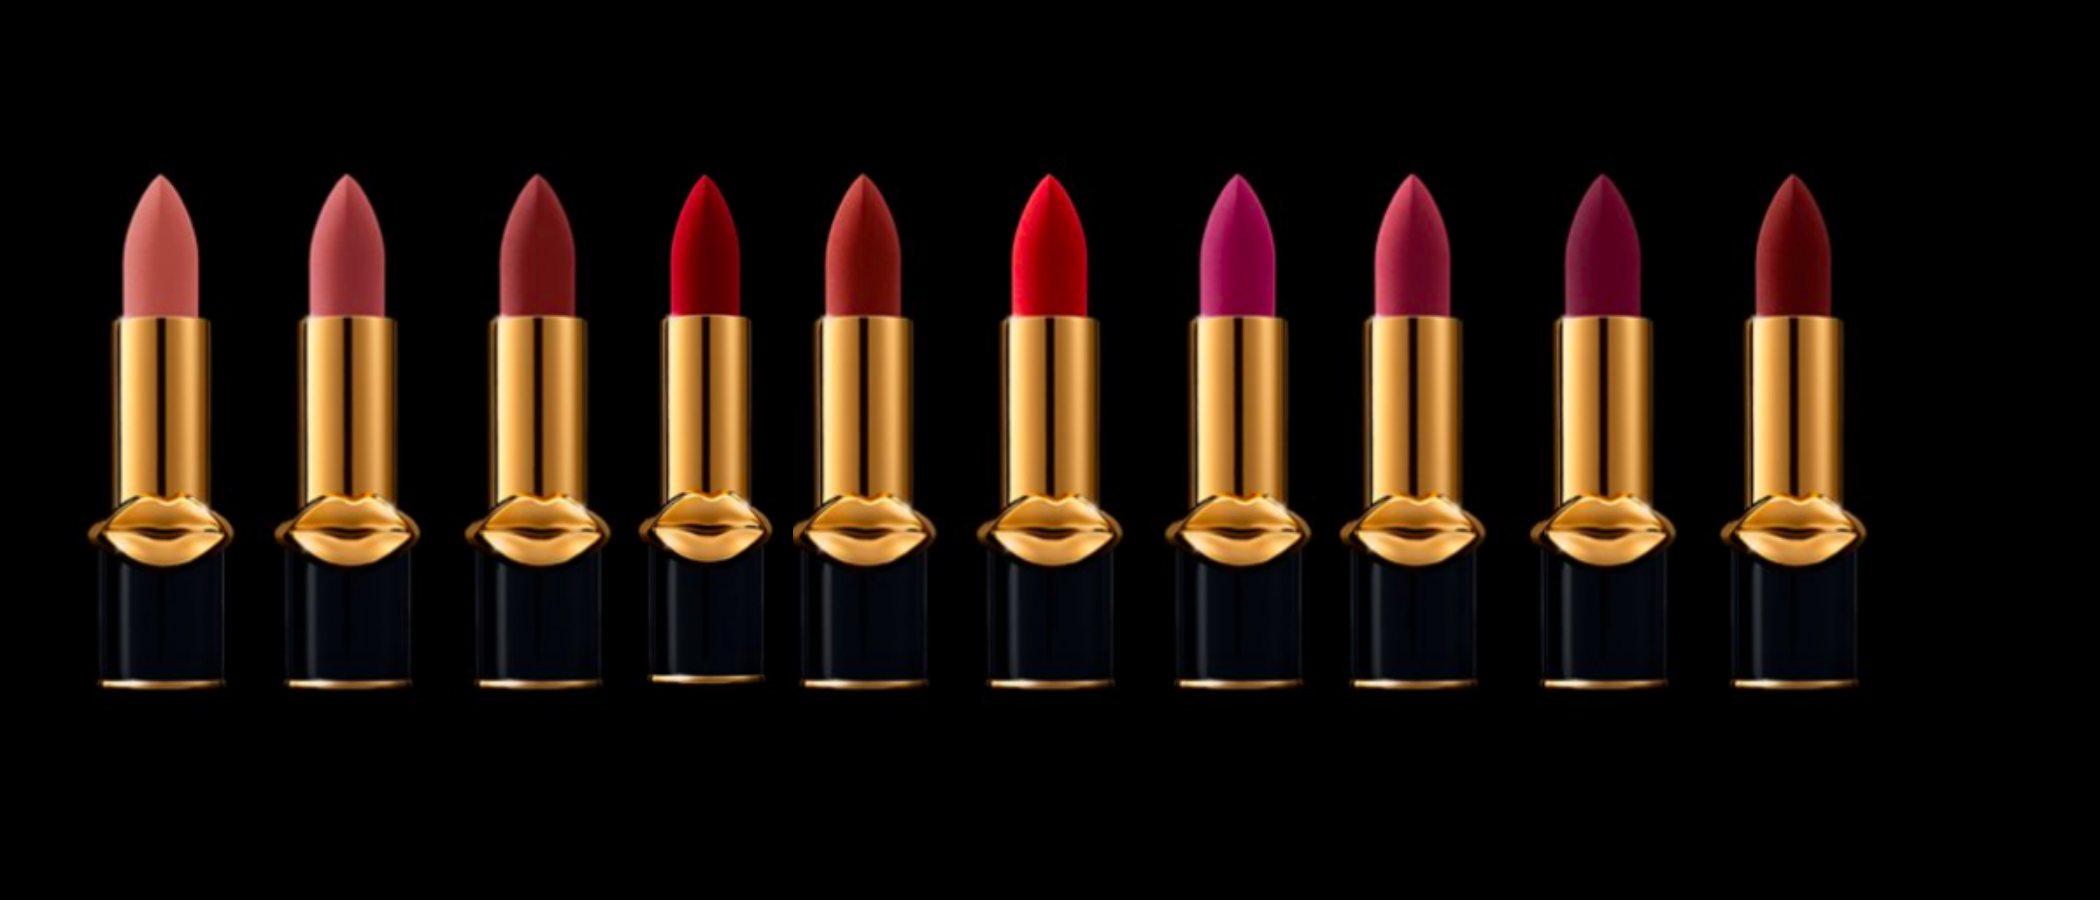 Pat McGrath Labs estrena 10 nuevos tonos de la barra de labios 'MatteTrance Lipstick'